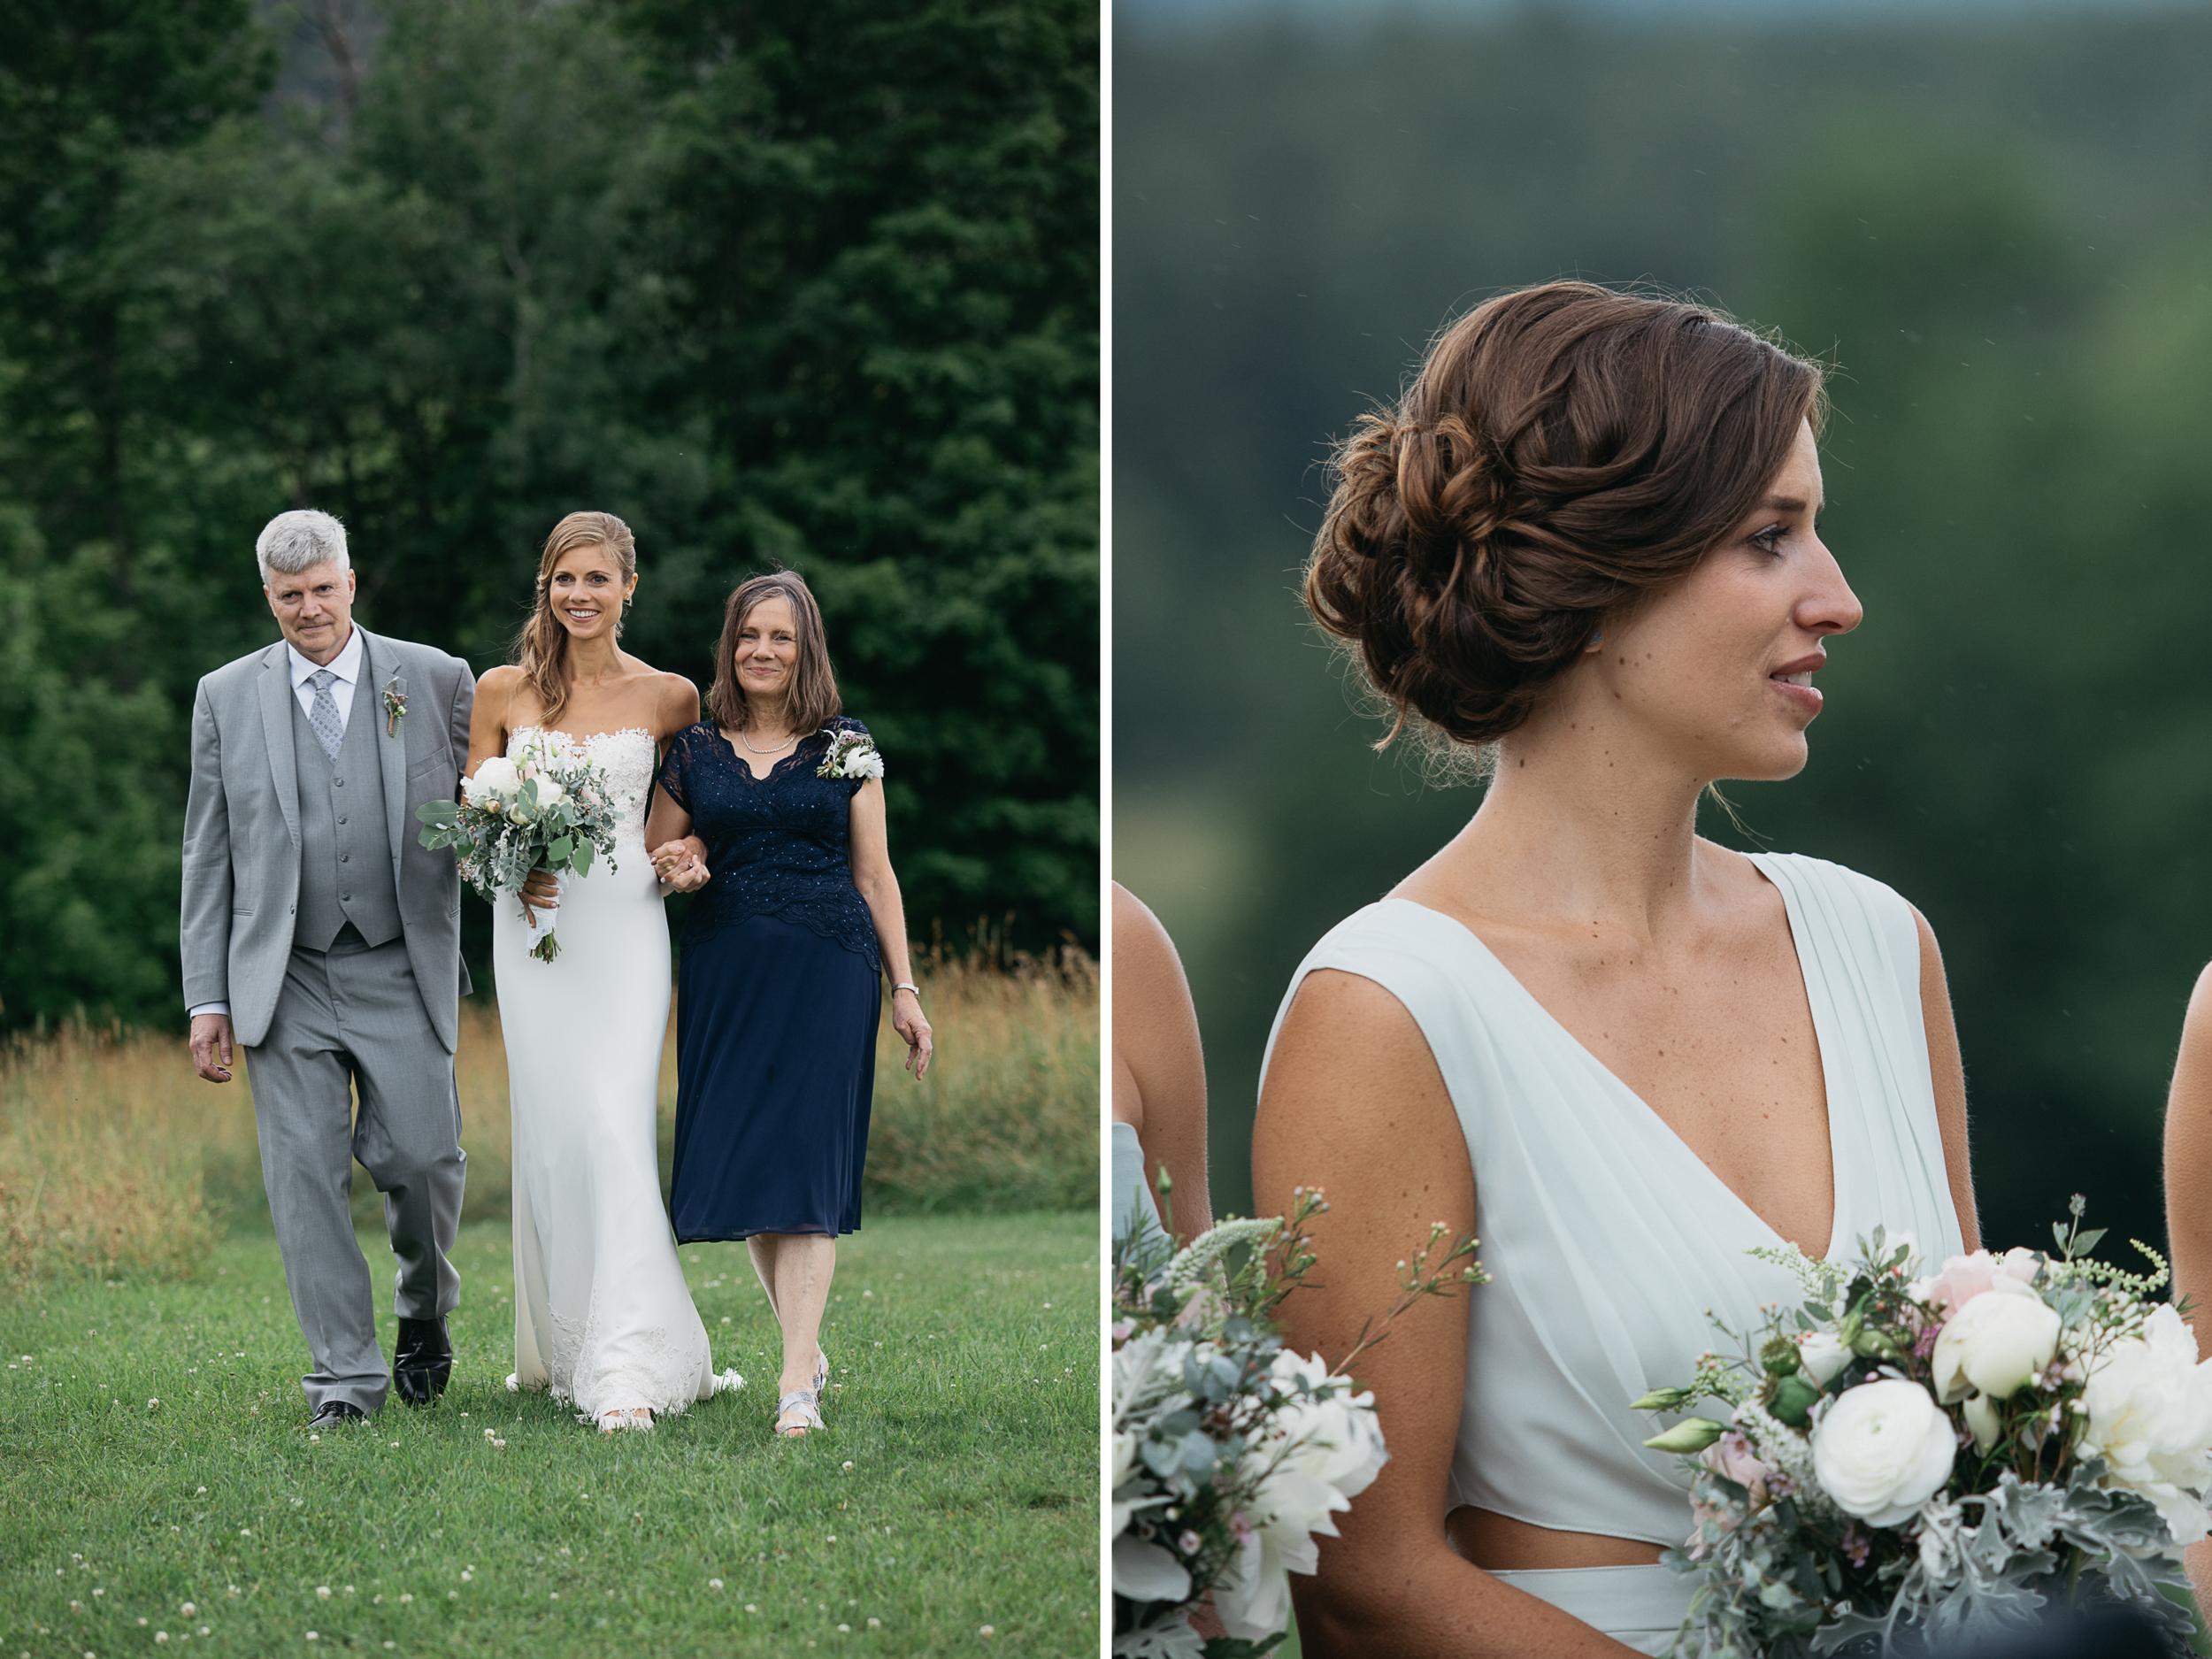 Karen_Alex_Bliss_ridge_farm_Vermont_wedding012.jpg